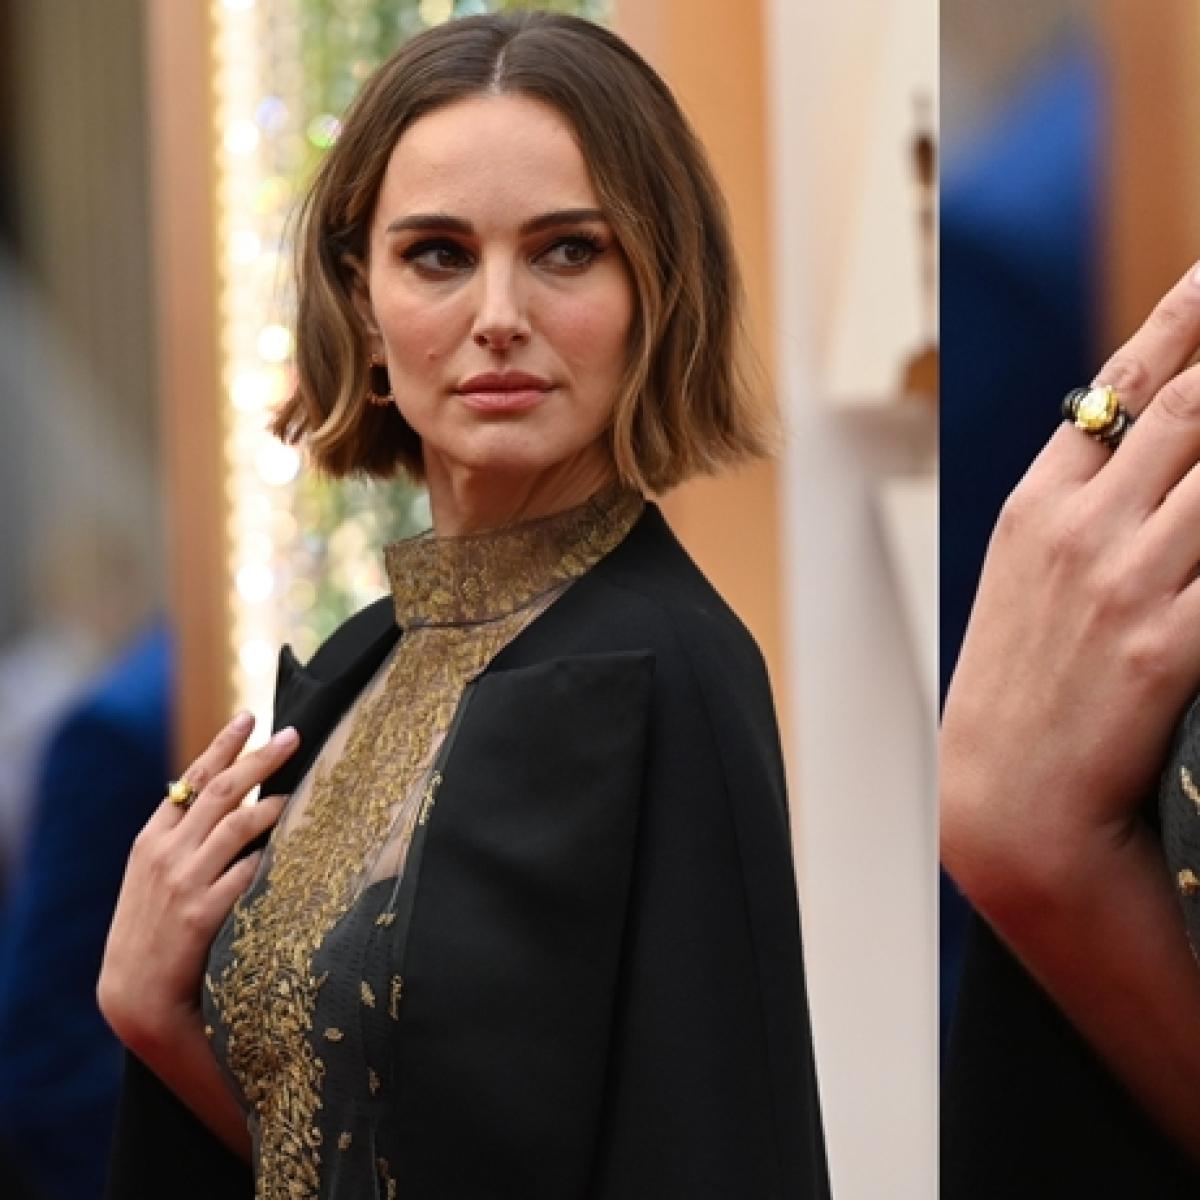 Oscars 2020: Natalie Portman's Dior cape has names of snubbed female directors